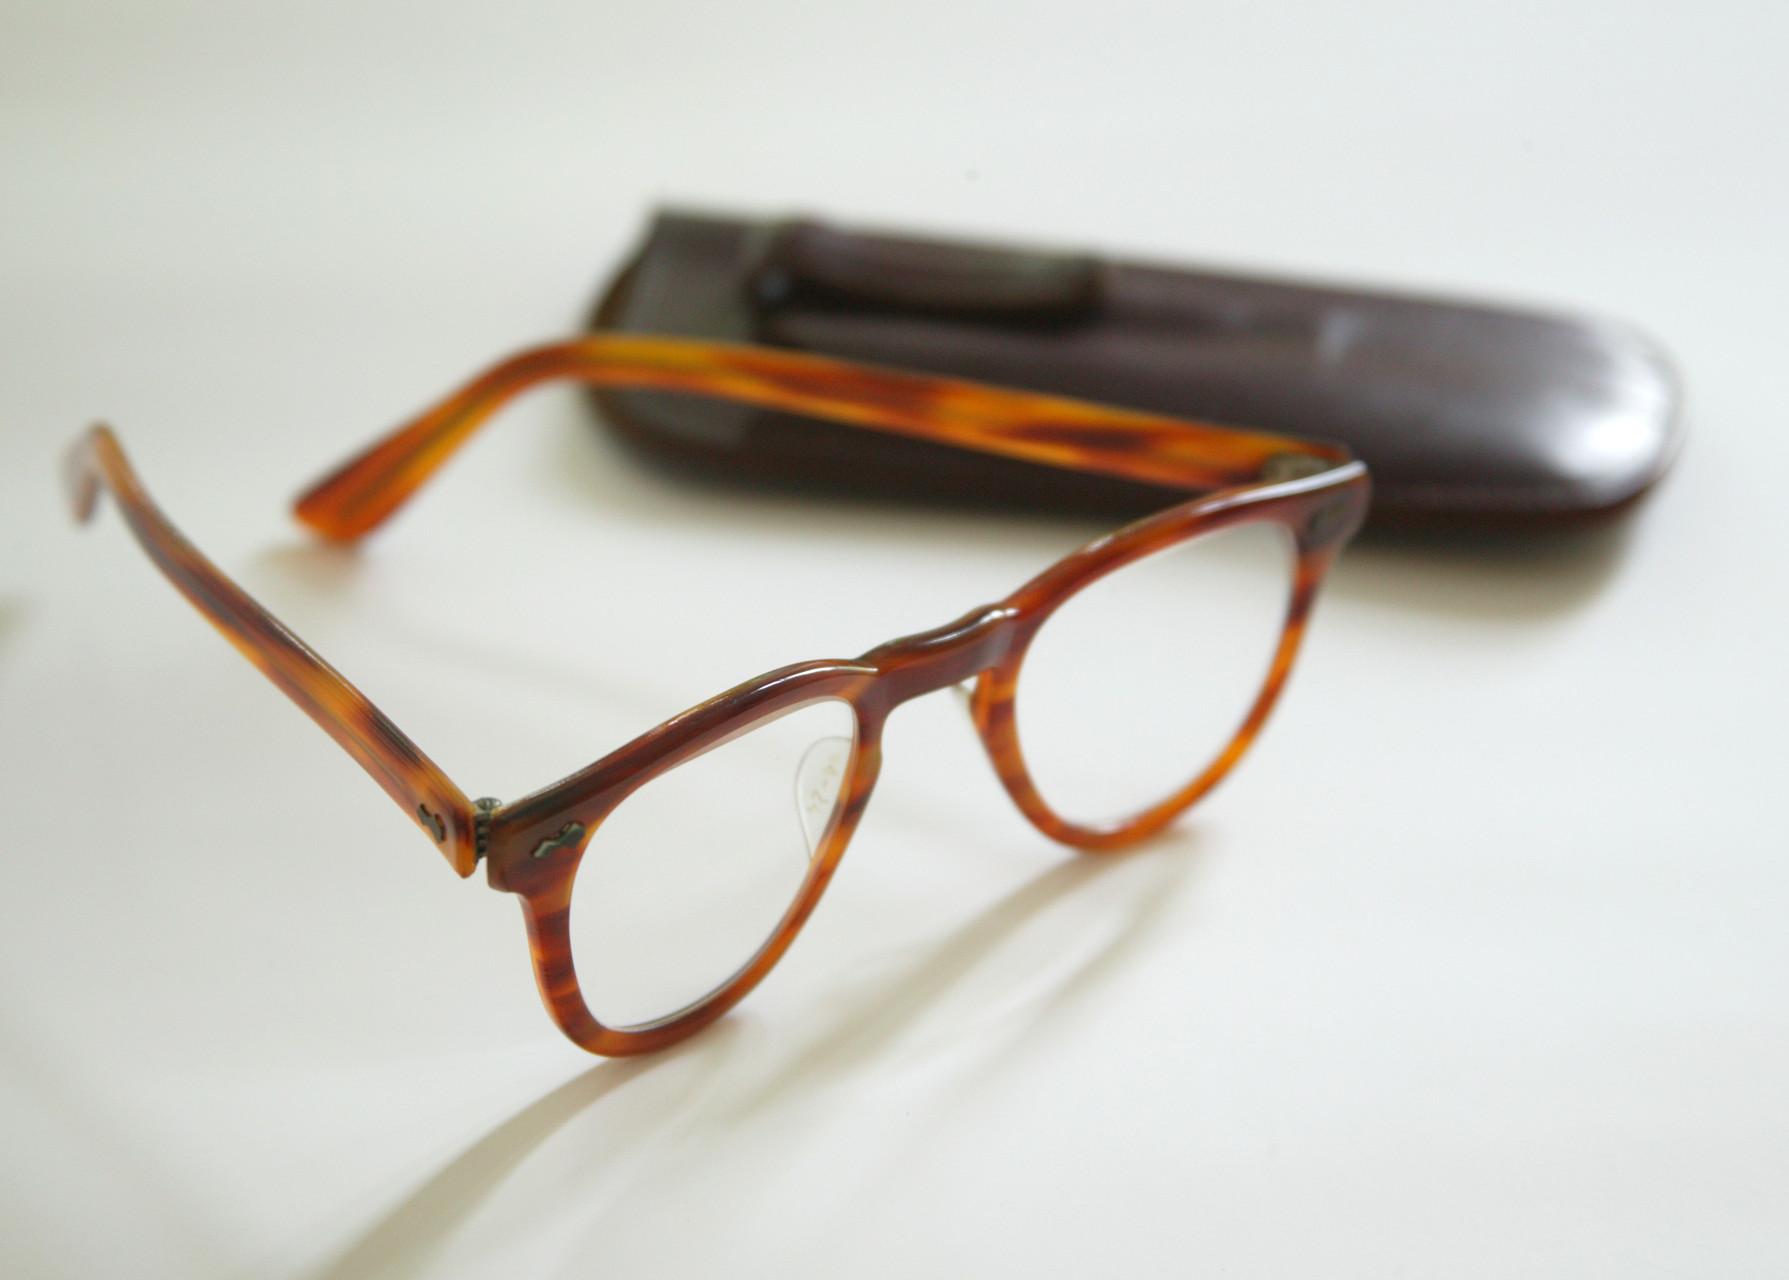 © CAMERA WORK · John F. Kennedy's reading glasses